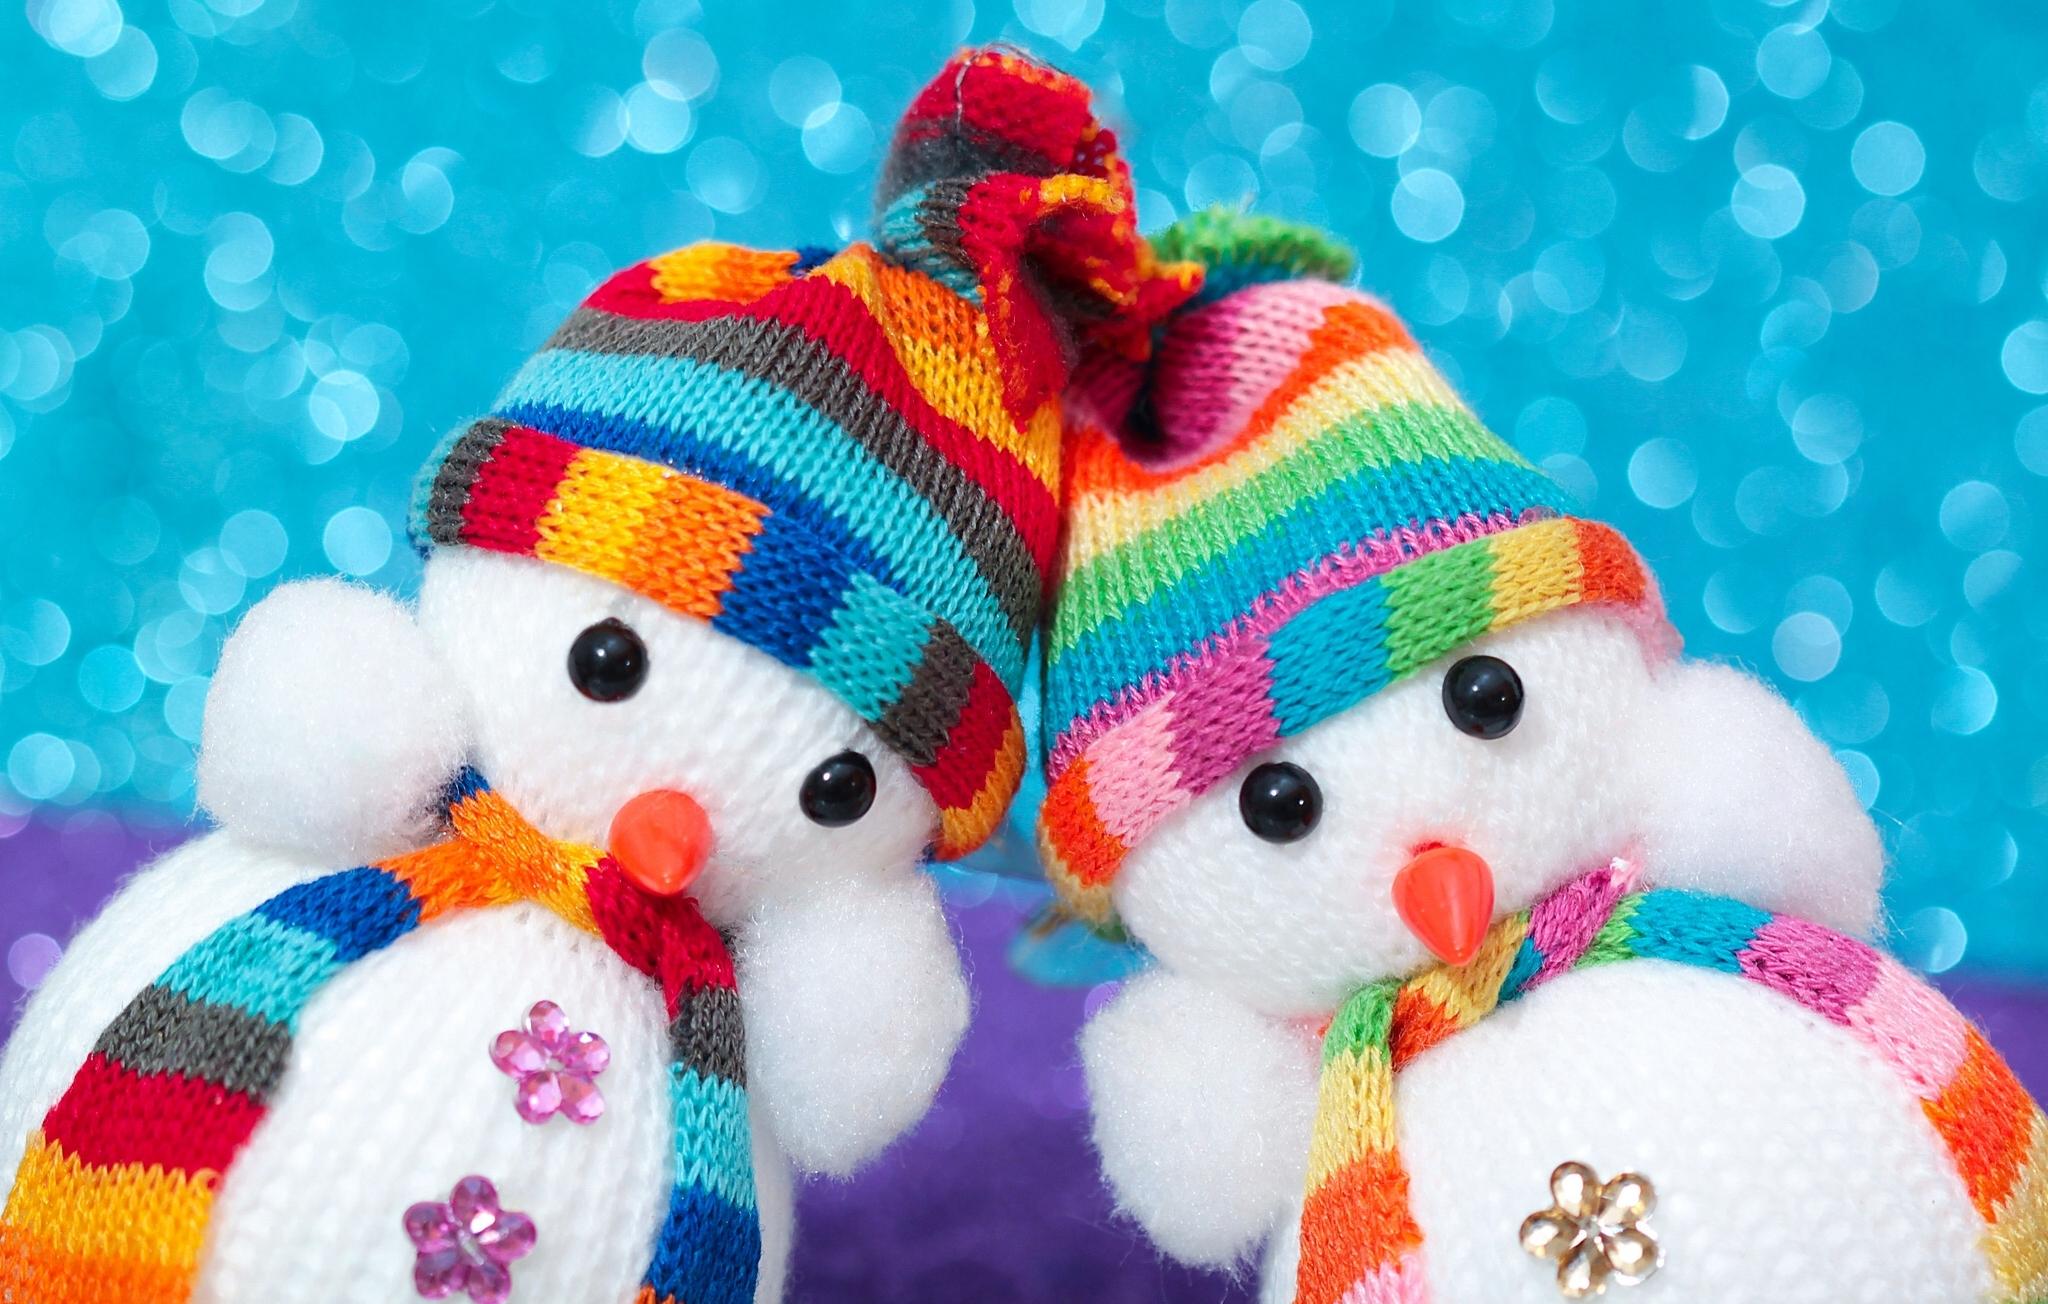 картинки на рабочий снеговик своих